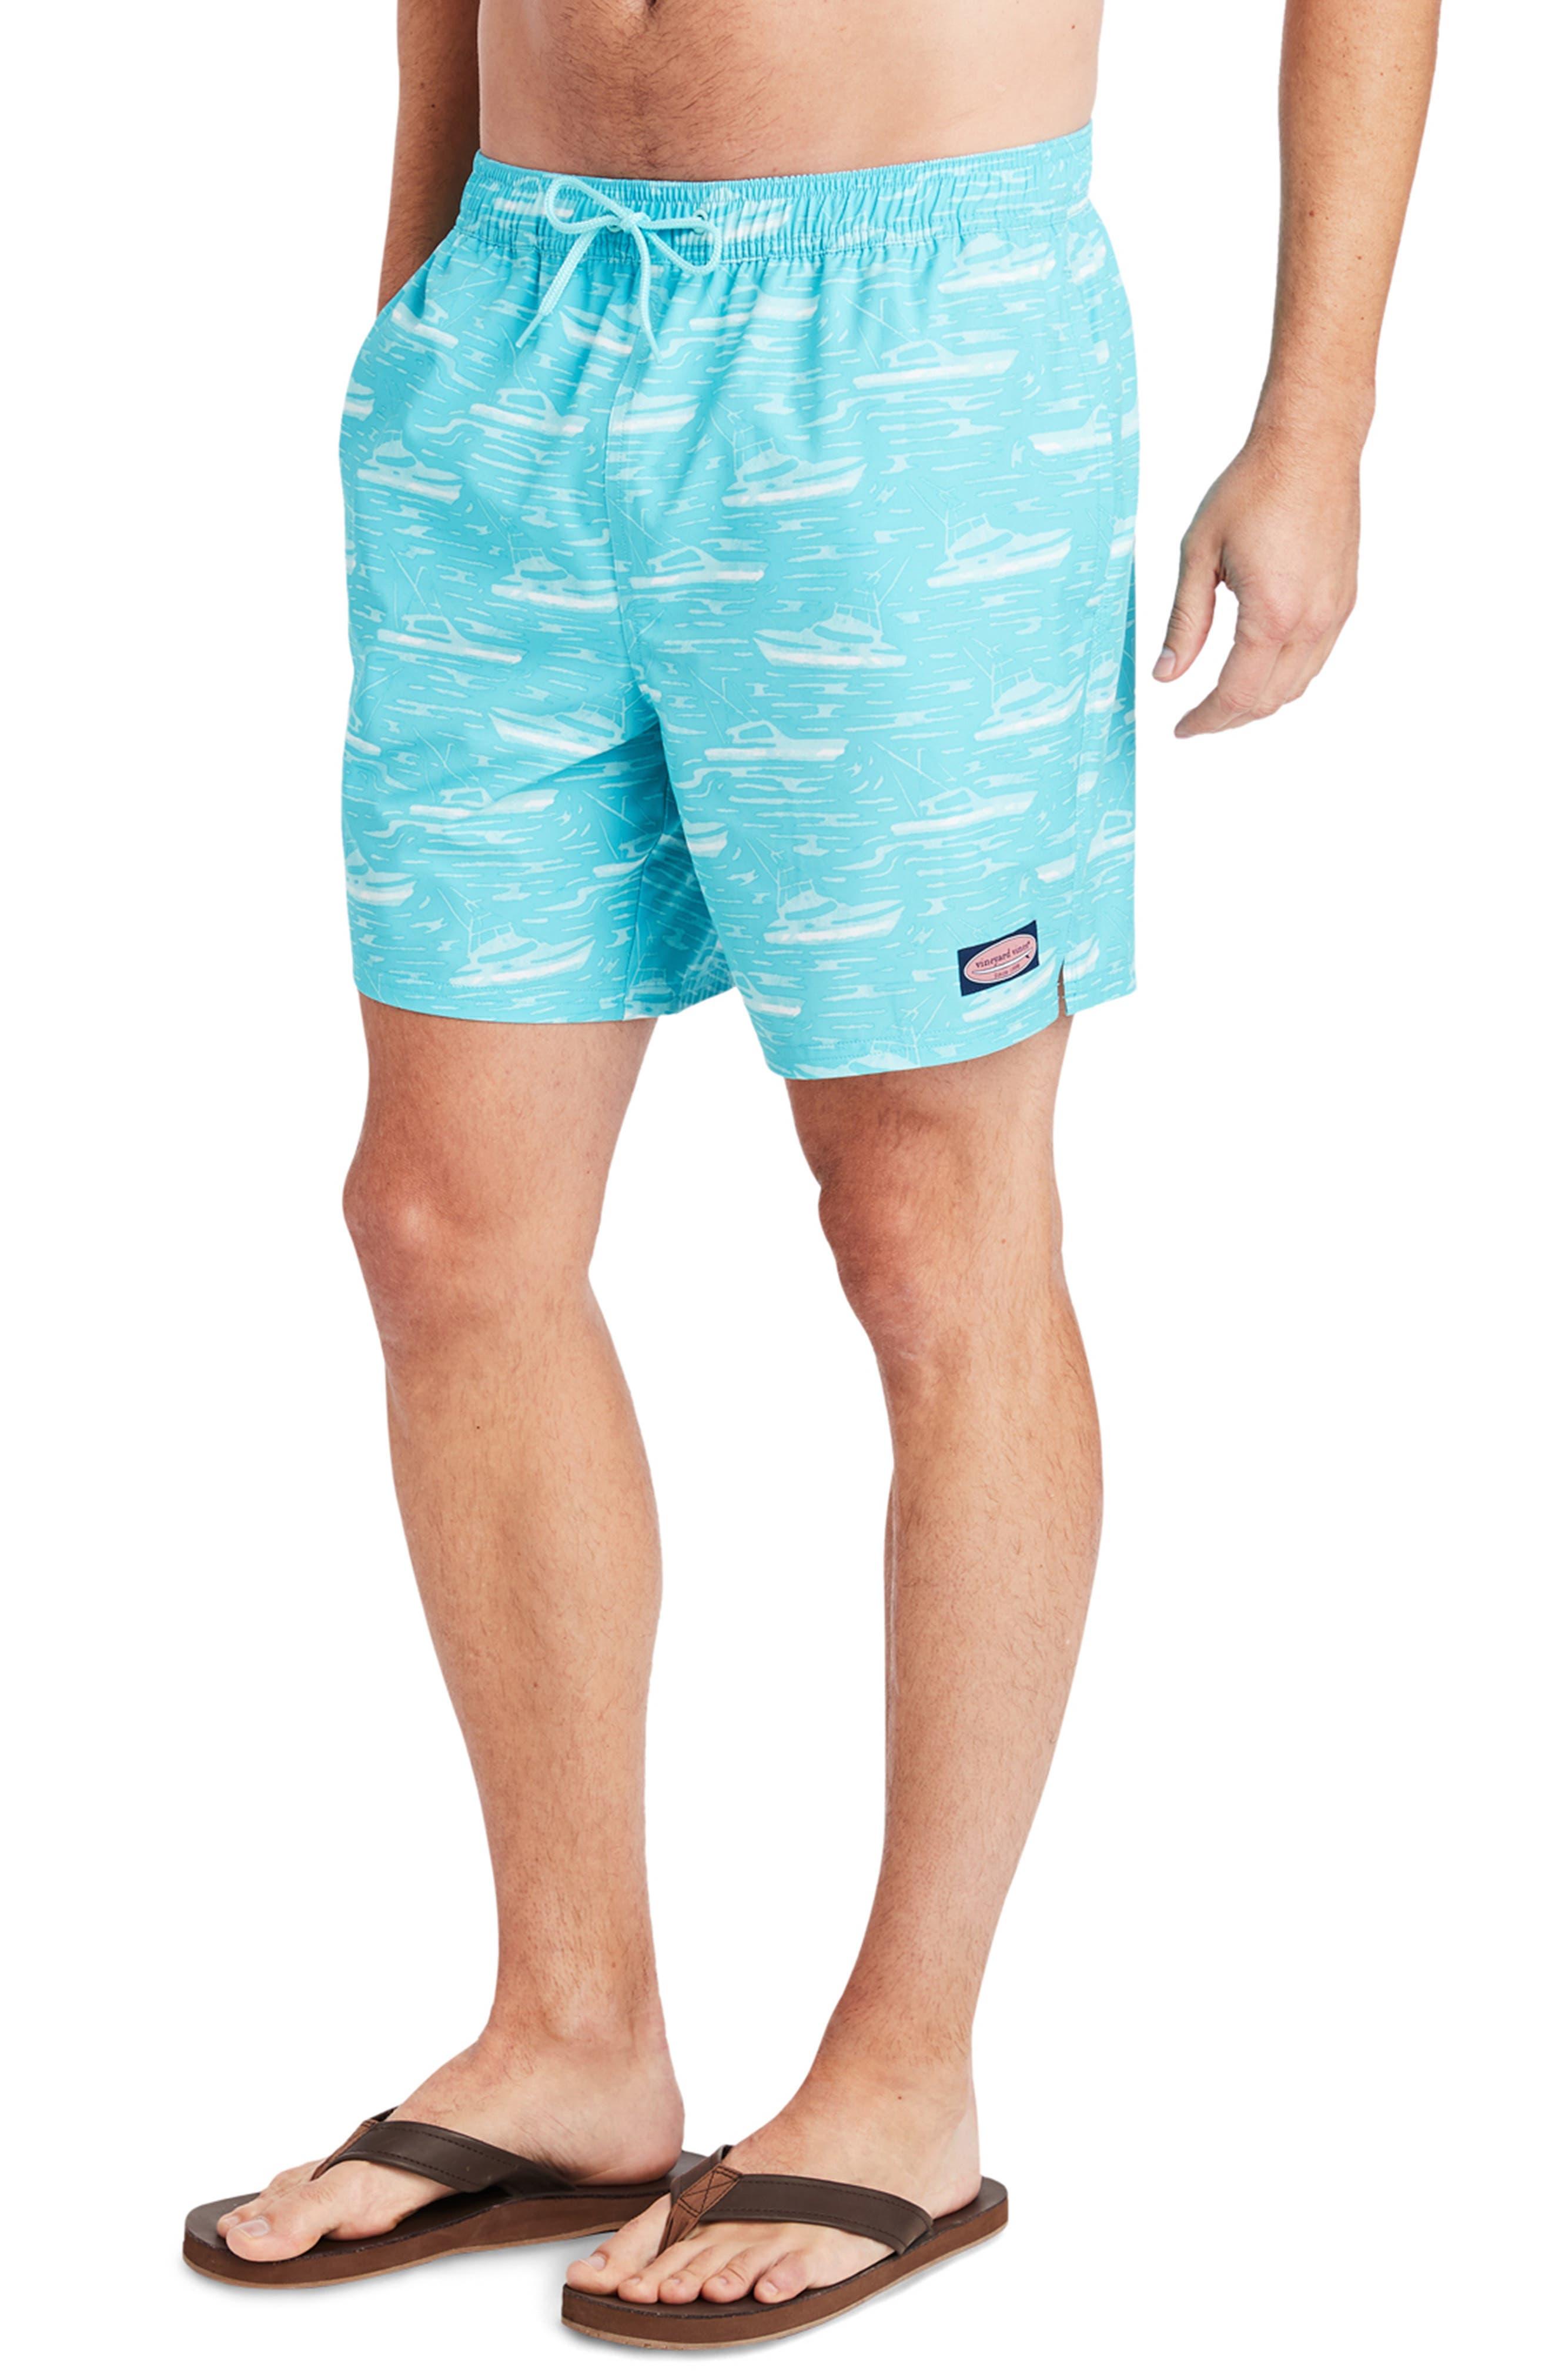 Vineyard Vines Summer Sailing Chappy Swim Trunks, Blue